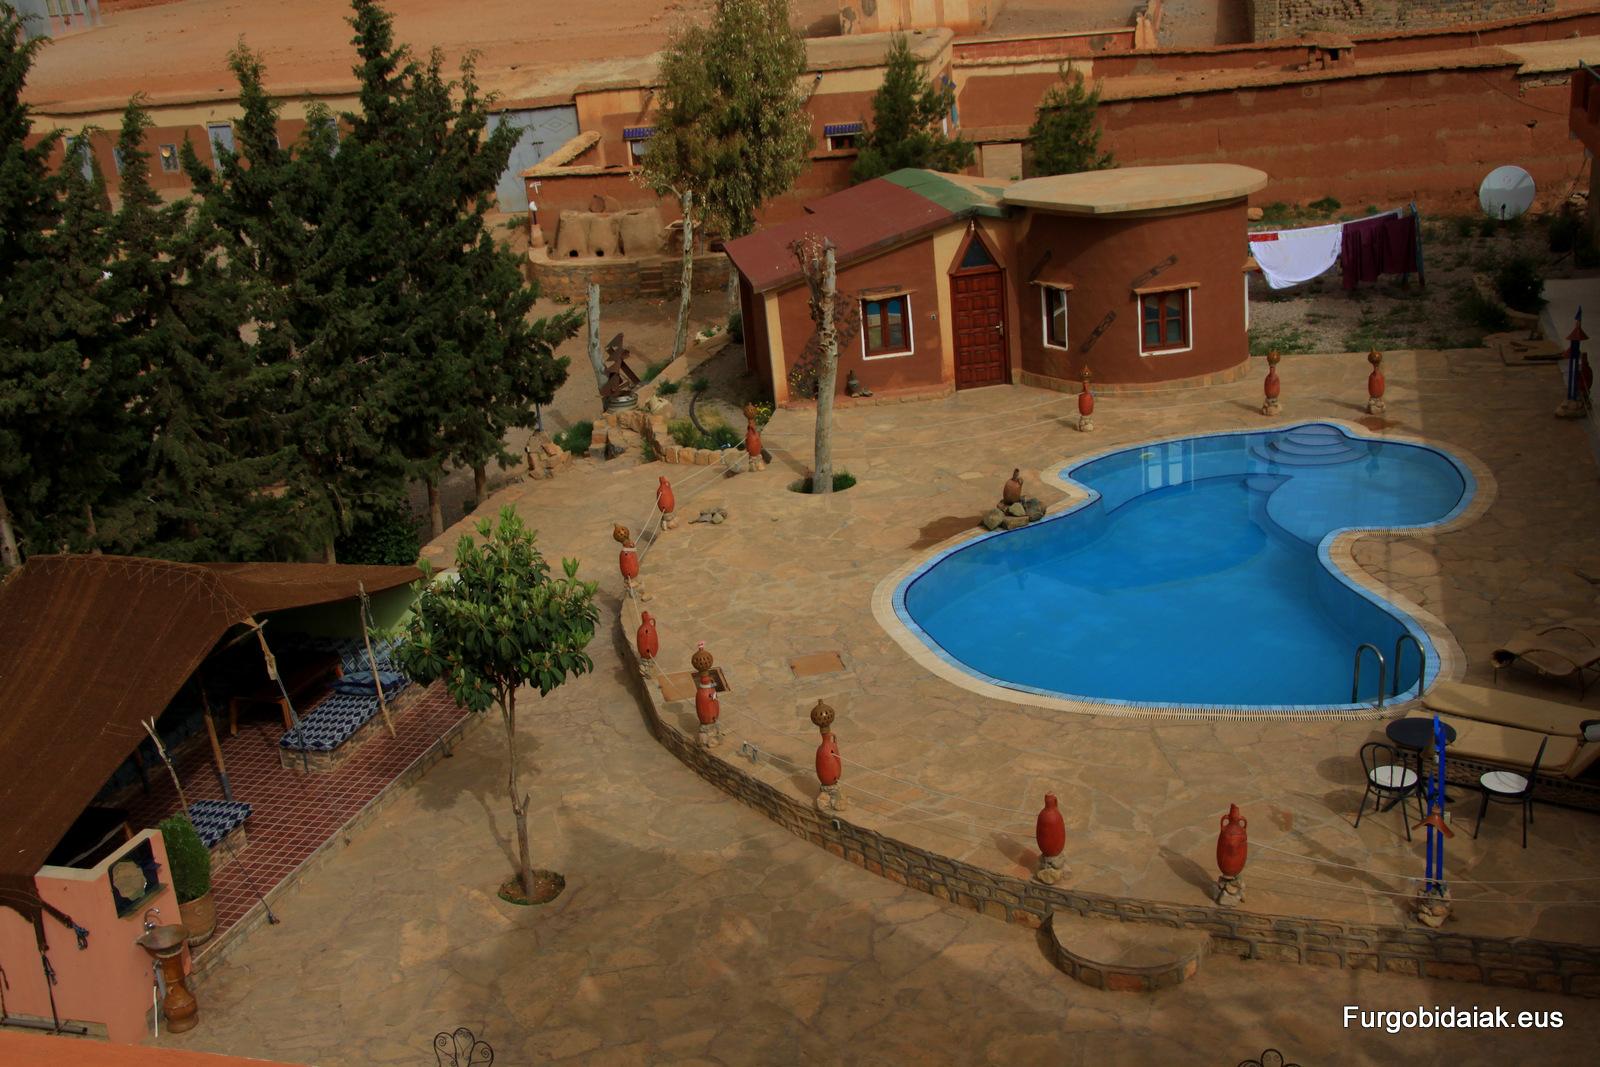 Alberge Baddou Marruecos